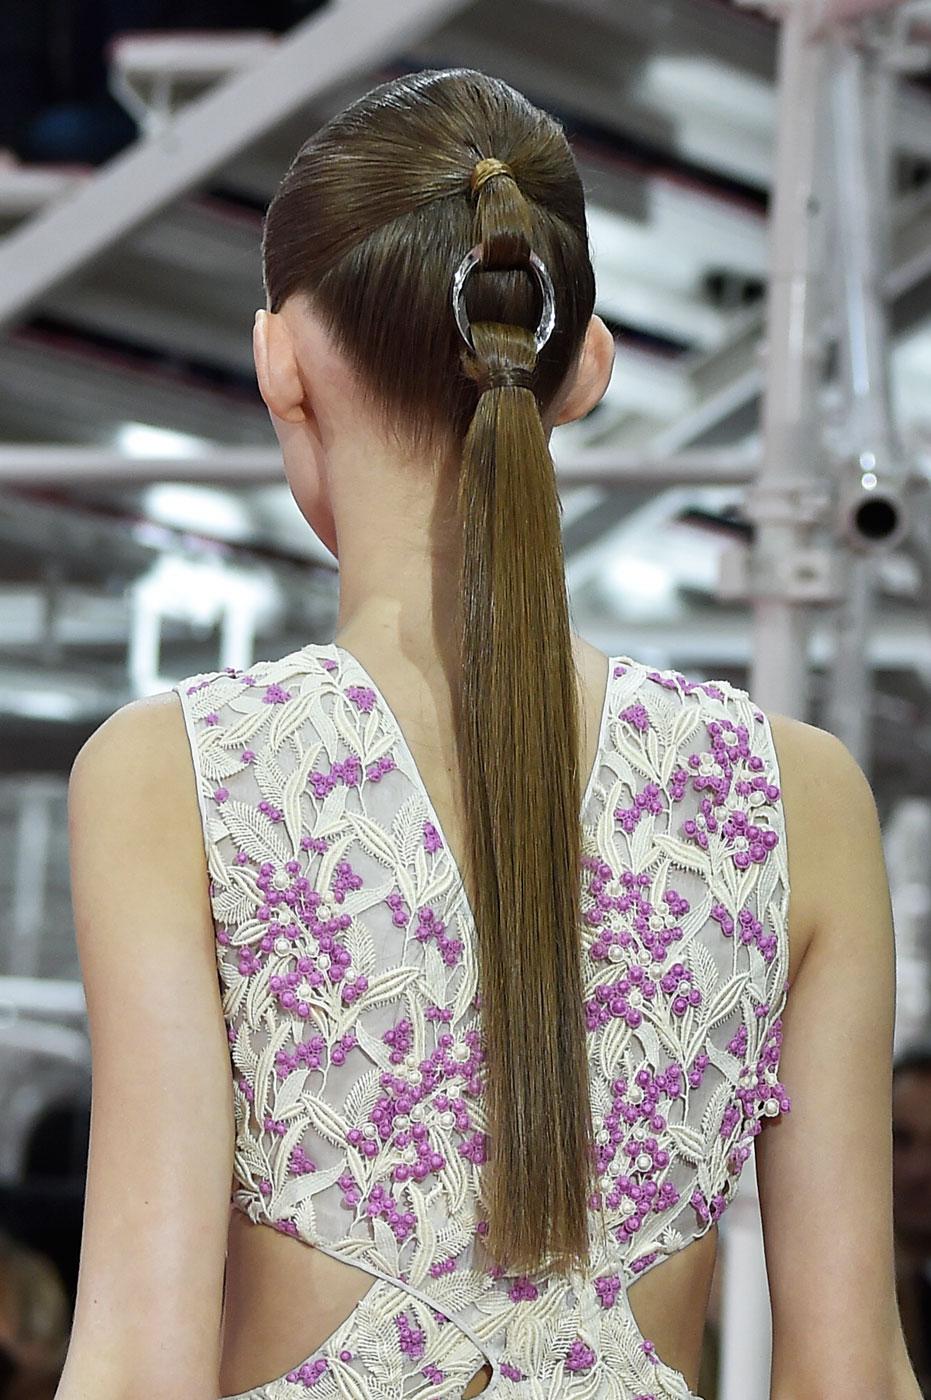 Christian-Dior-fashion-runway-show-close-ups-haute-couture-paris-spring-summer-2015-the-impression-059